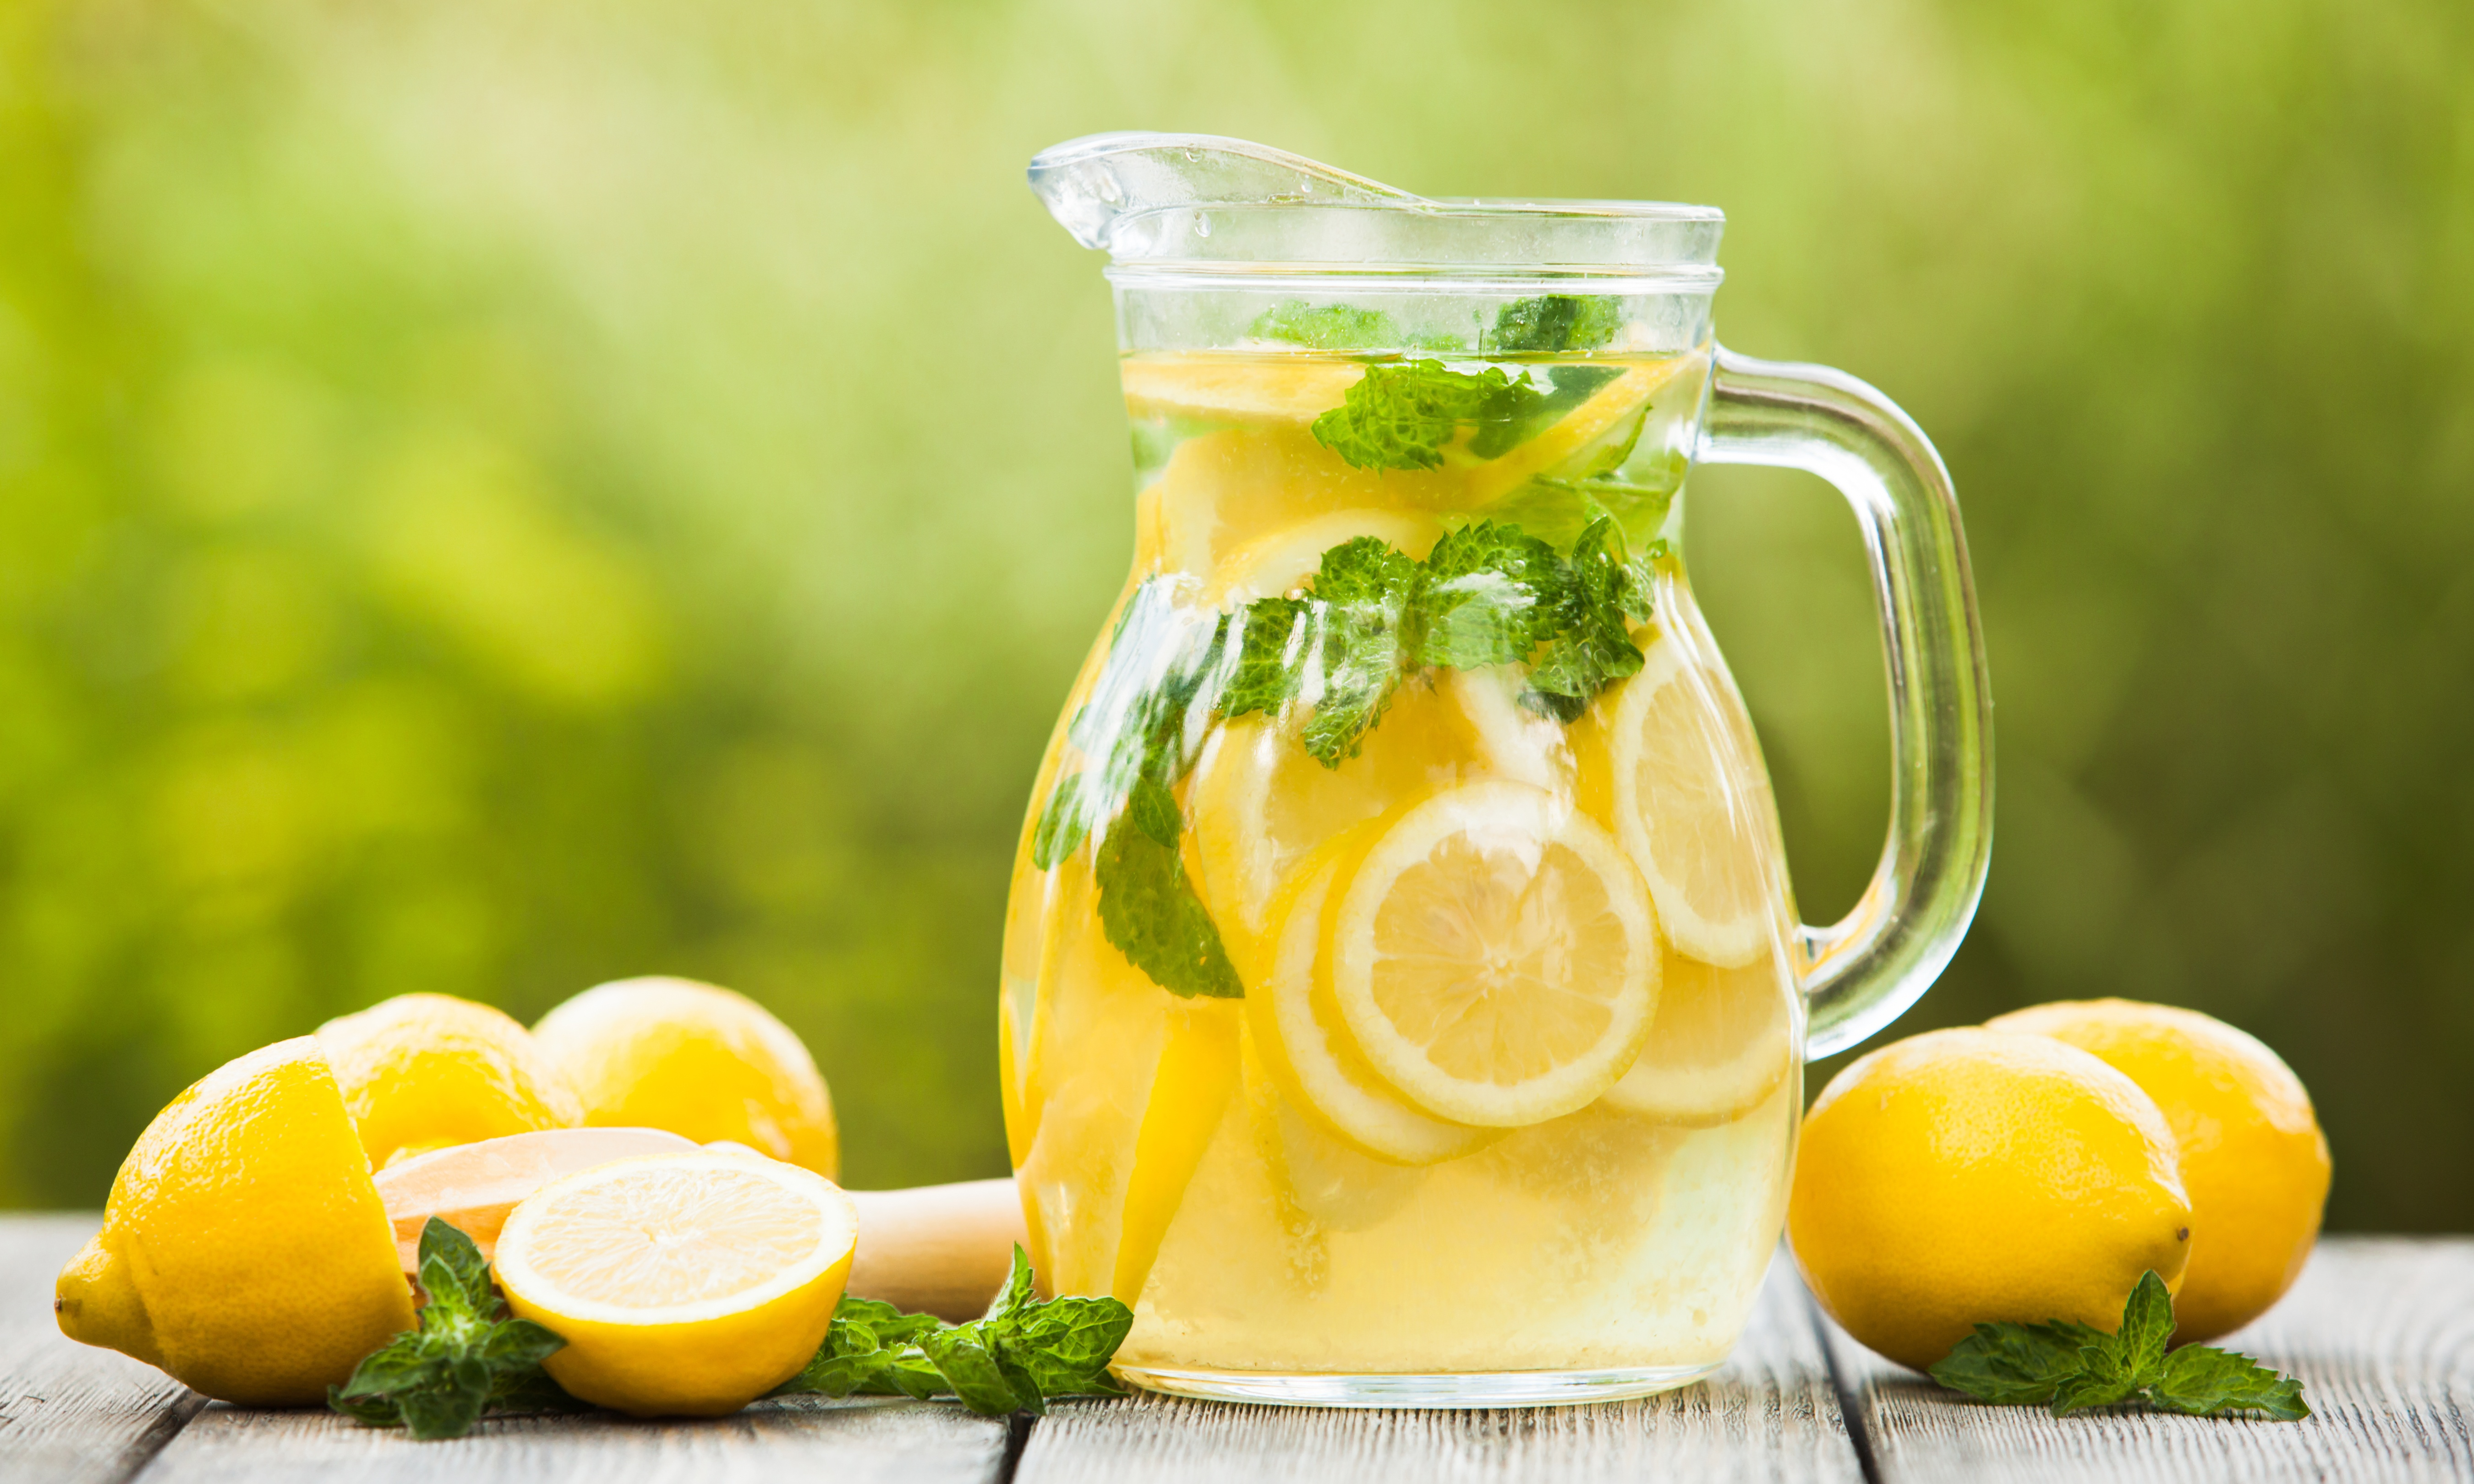 How to Make Lemonade Out of Lemons